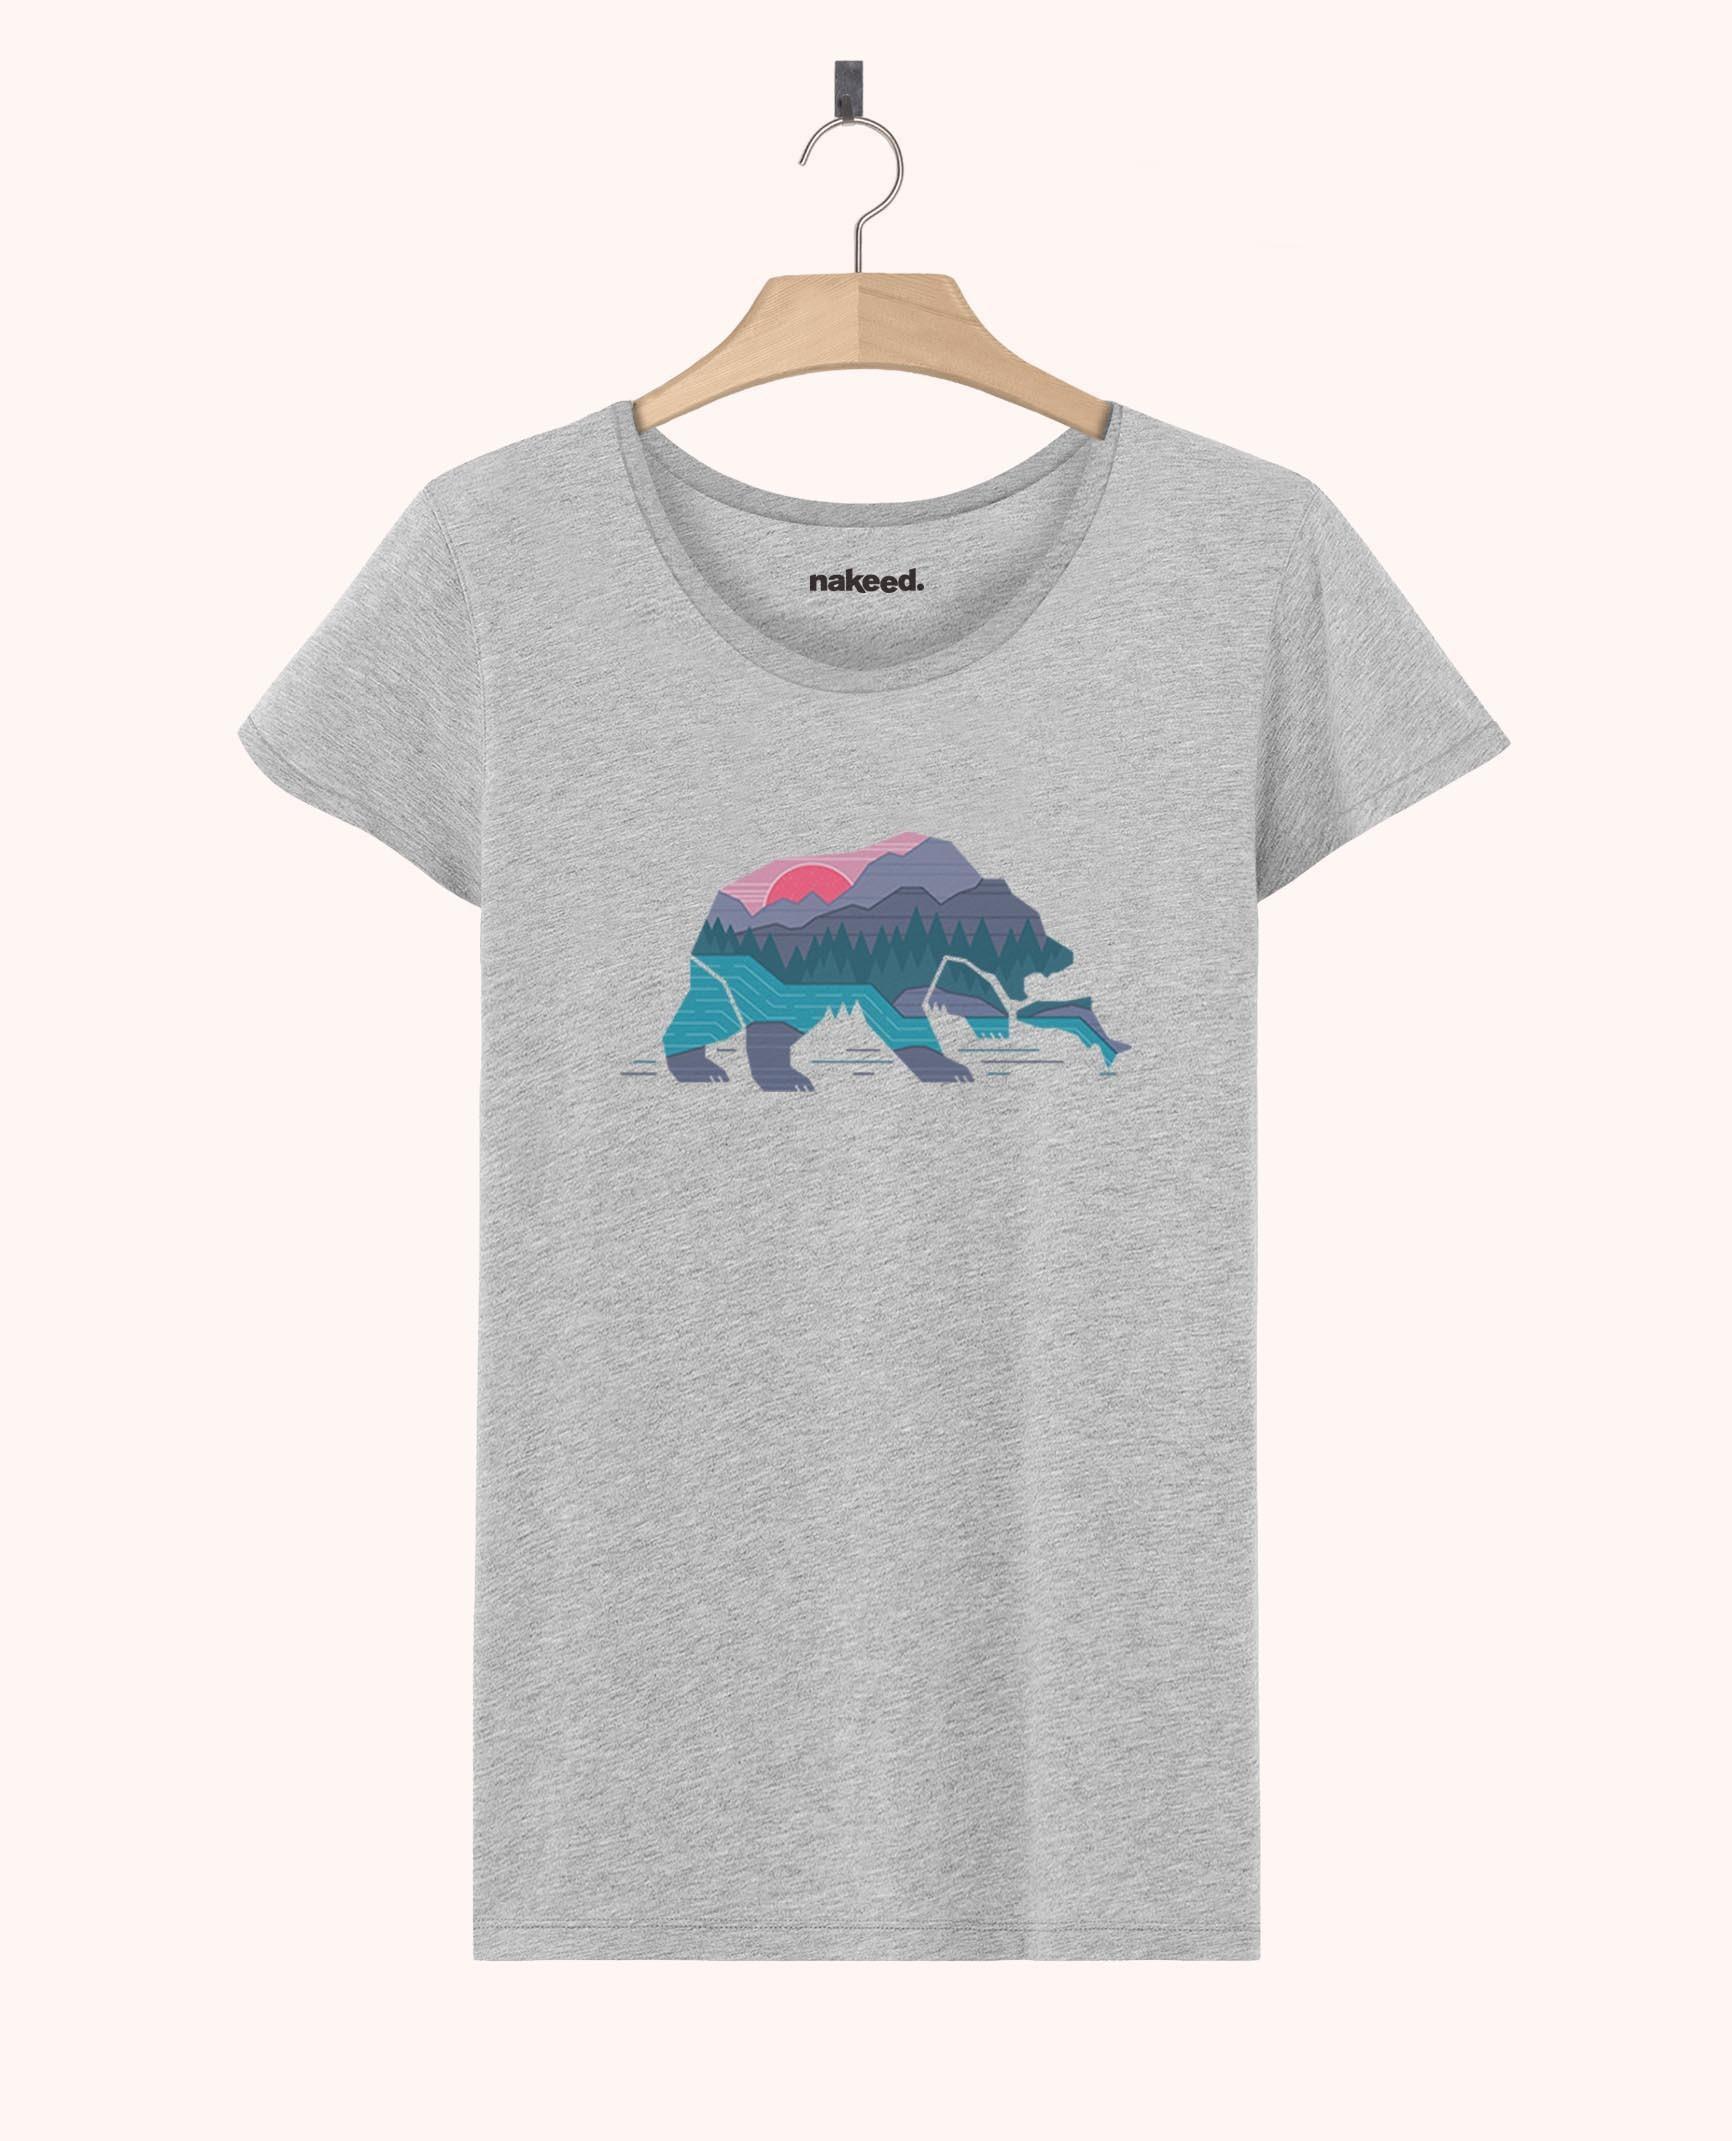 Teeshirt Bear Country